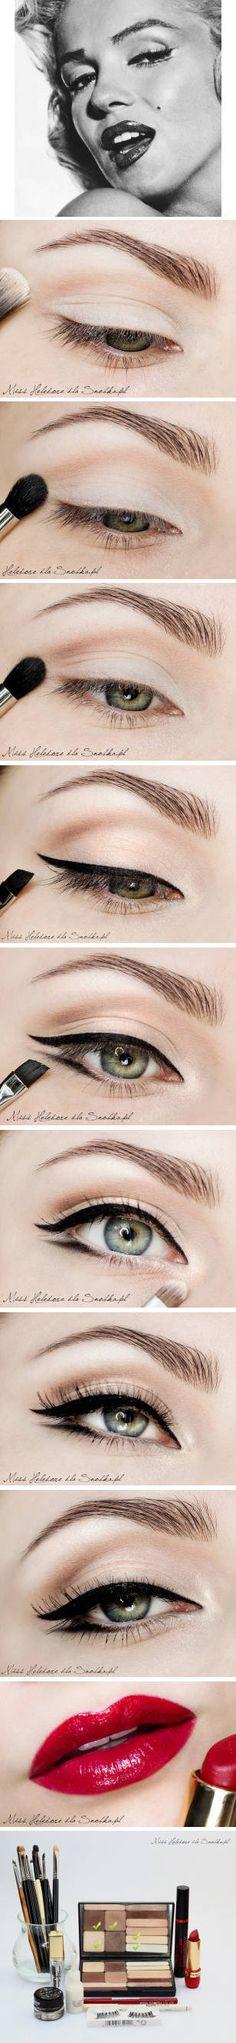 pin up makeup, makeup tutorials, beauty makeup, marilyn monroe, eye makeup, cat eyes, everyday style, red lips, eye liner